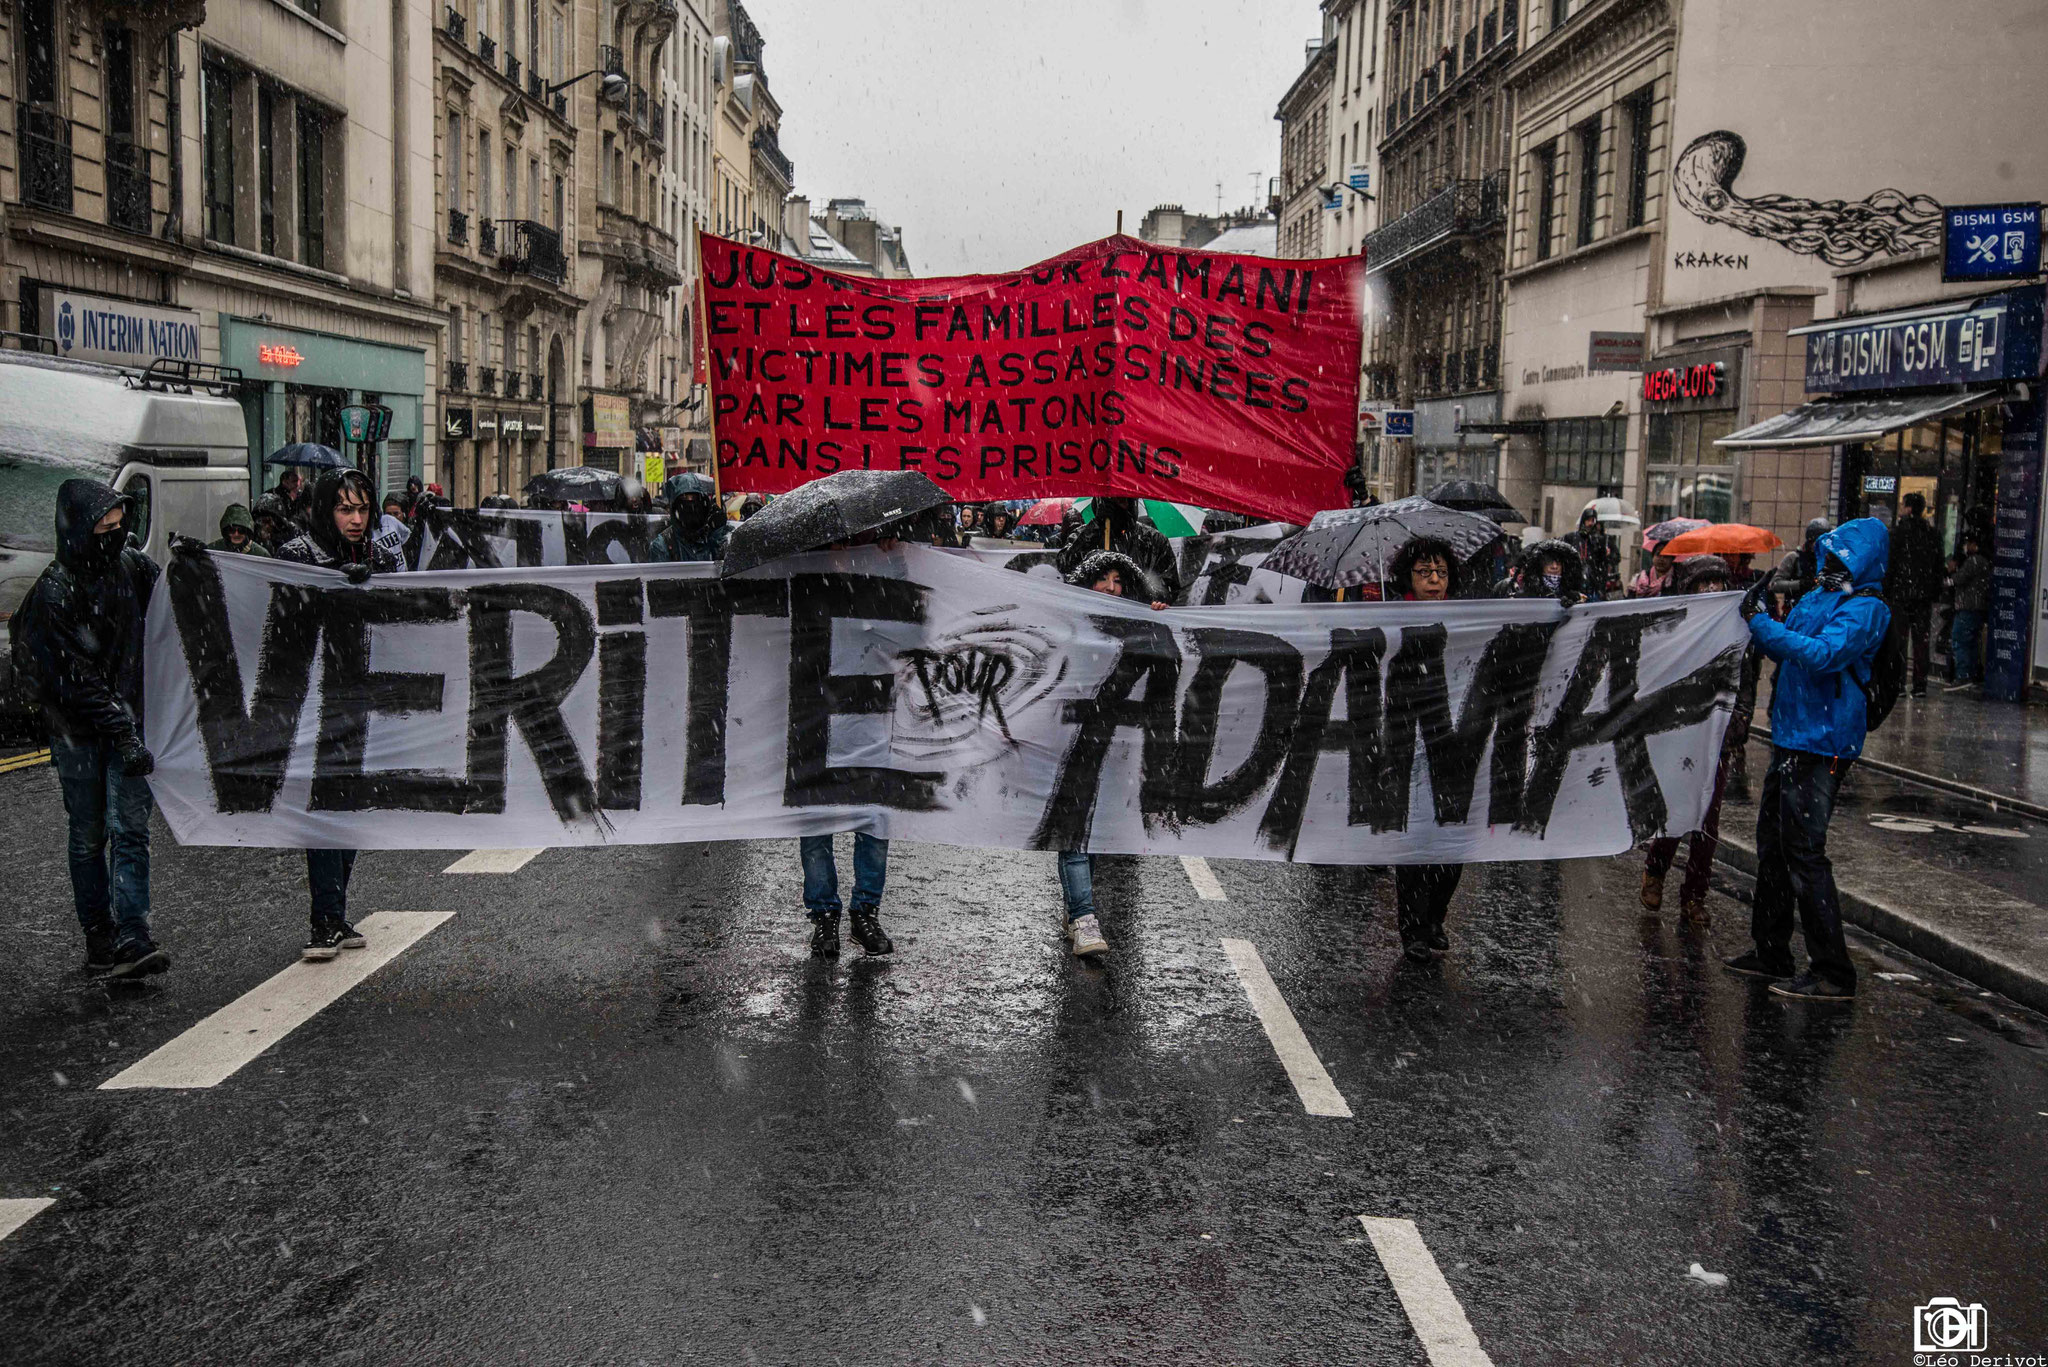 Marche solidarité, Paris, 17 Mars 2018